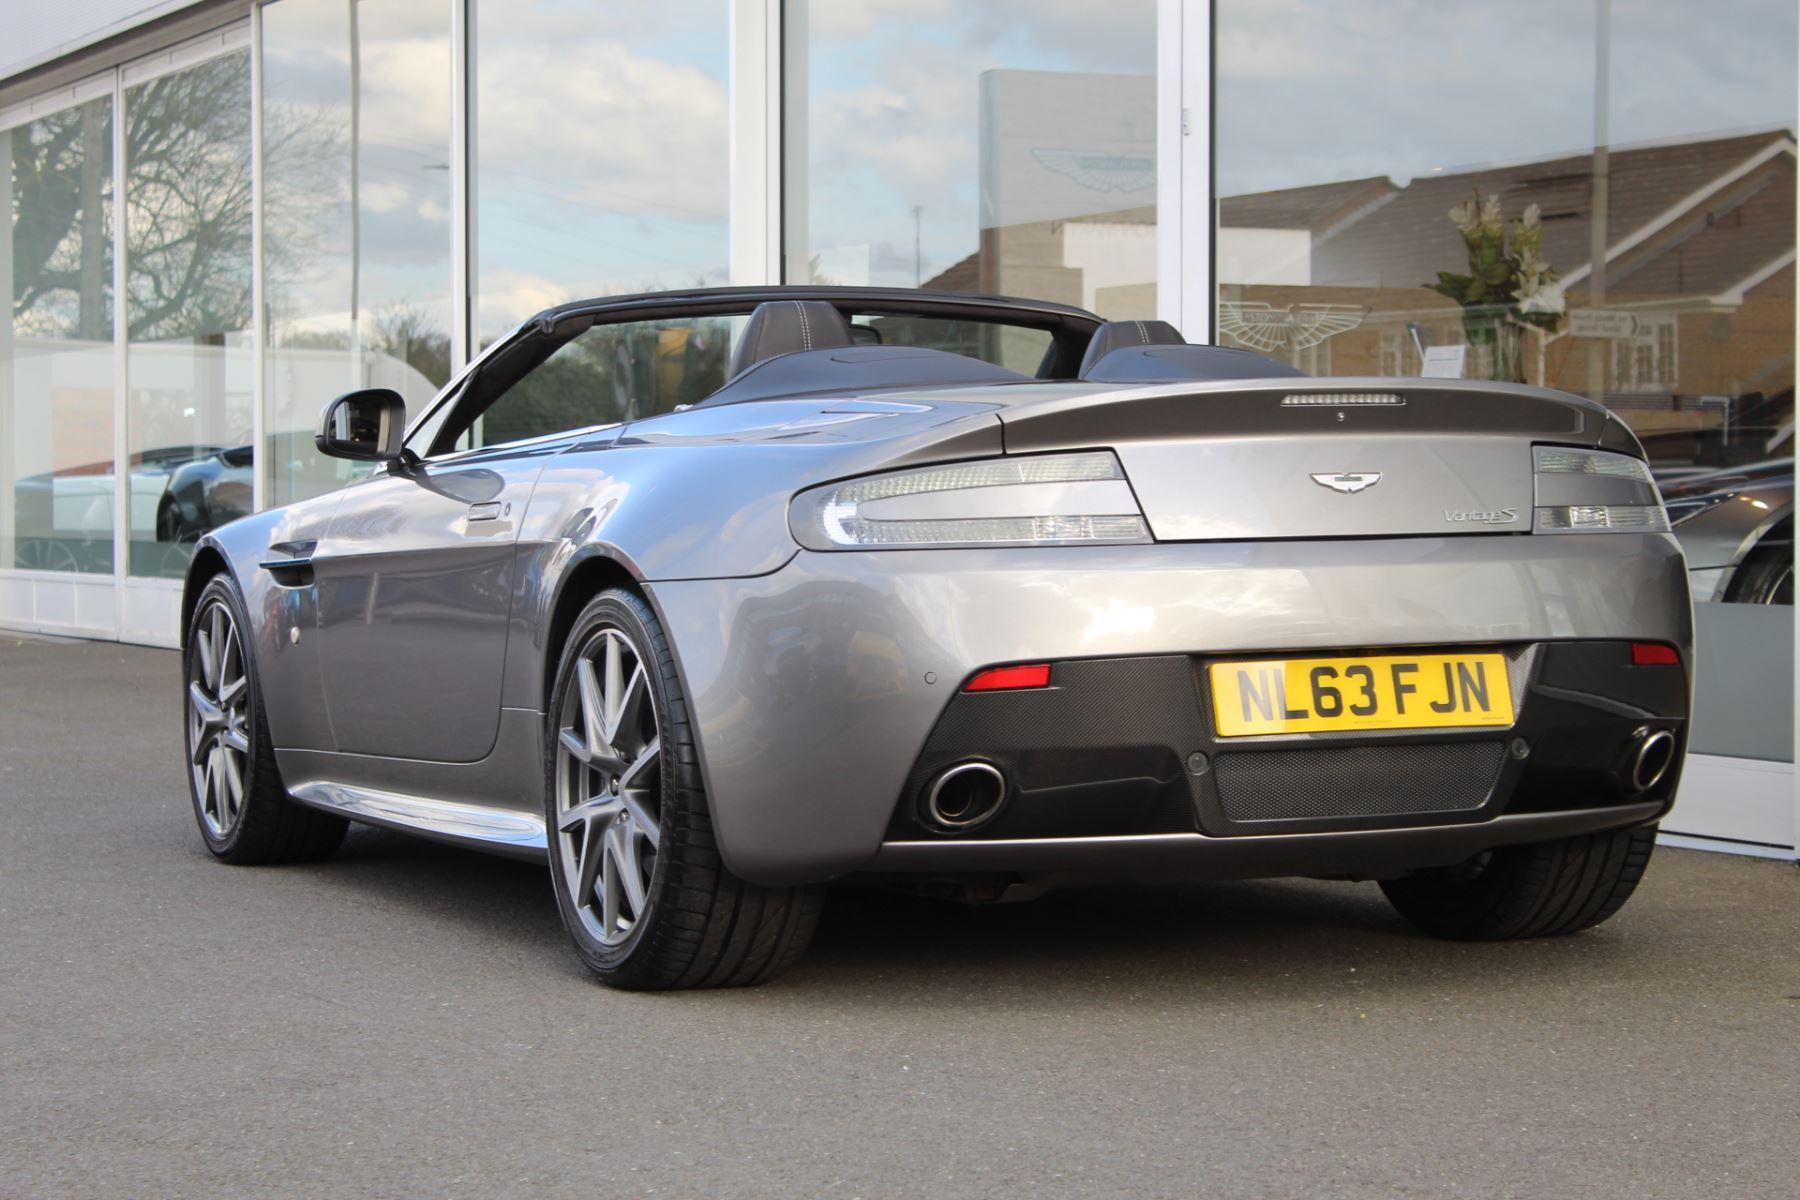 Aston Martin V8 Vantage S Roadster S 2dr Sportshift  Rare S Model  image 14